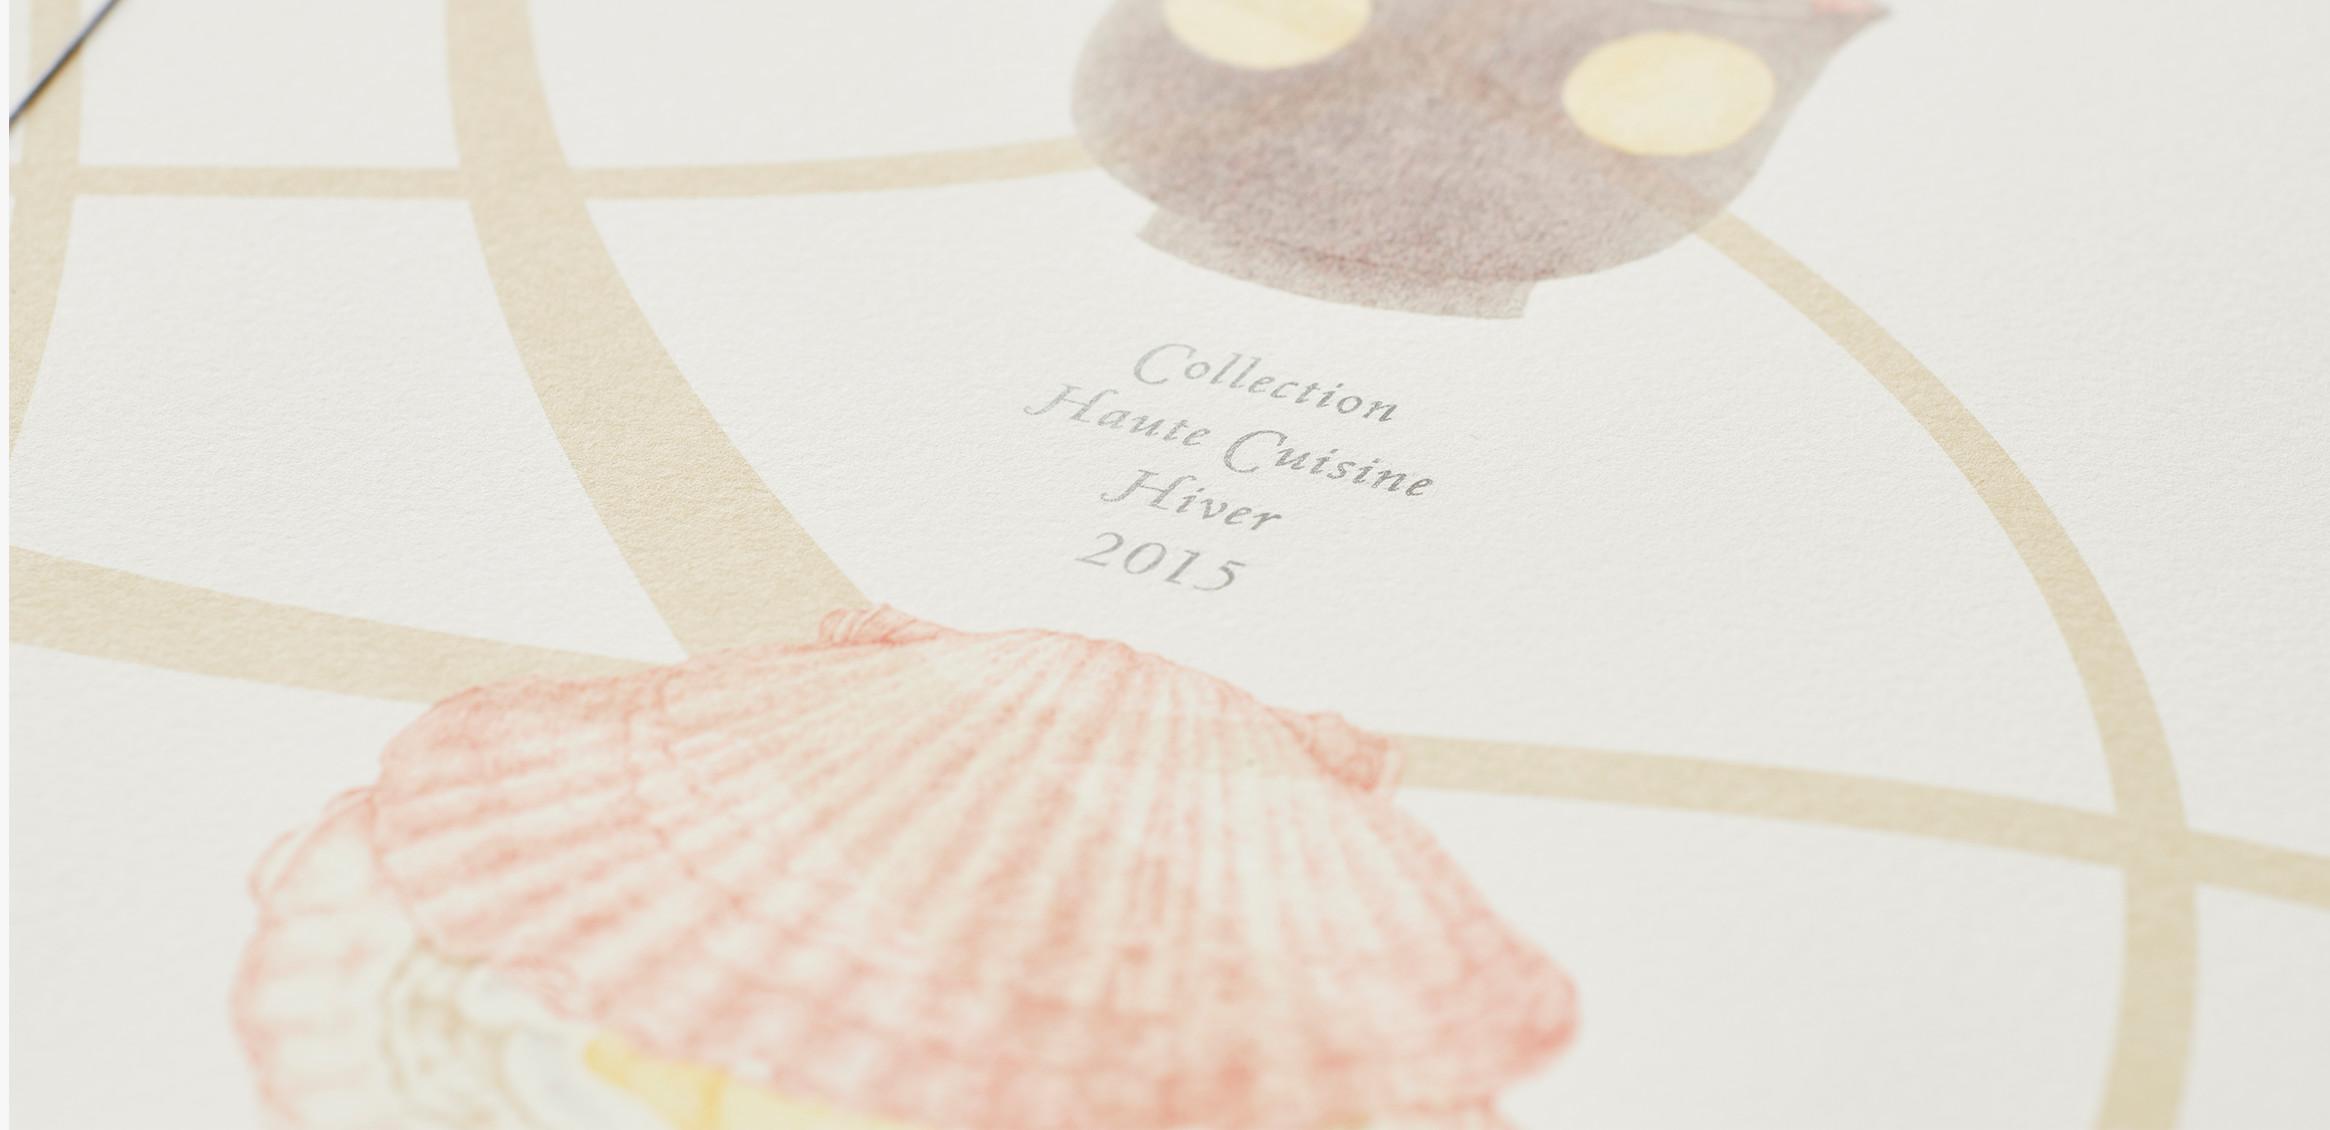 Collection Haute Cuisine Hiver 20156枚目